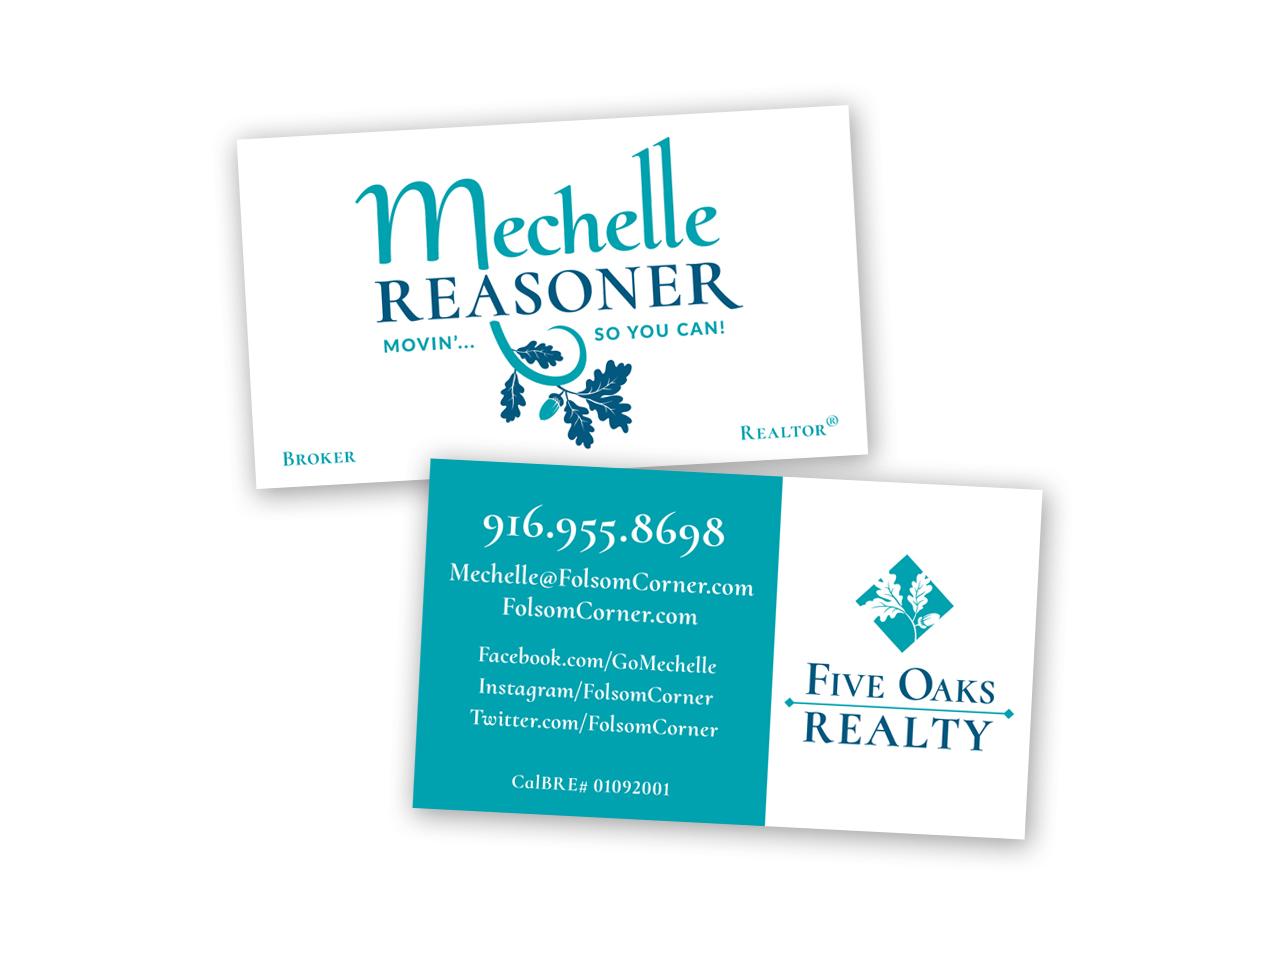 Corporate Design | Business Card Reasoner Five Oaks Realty Sacramento